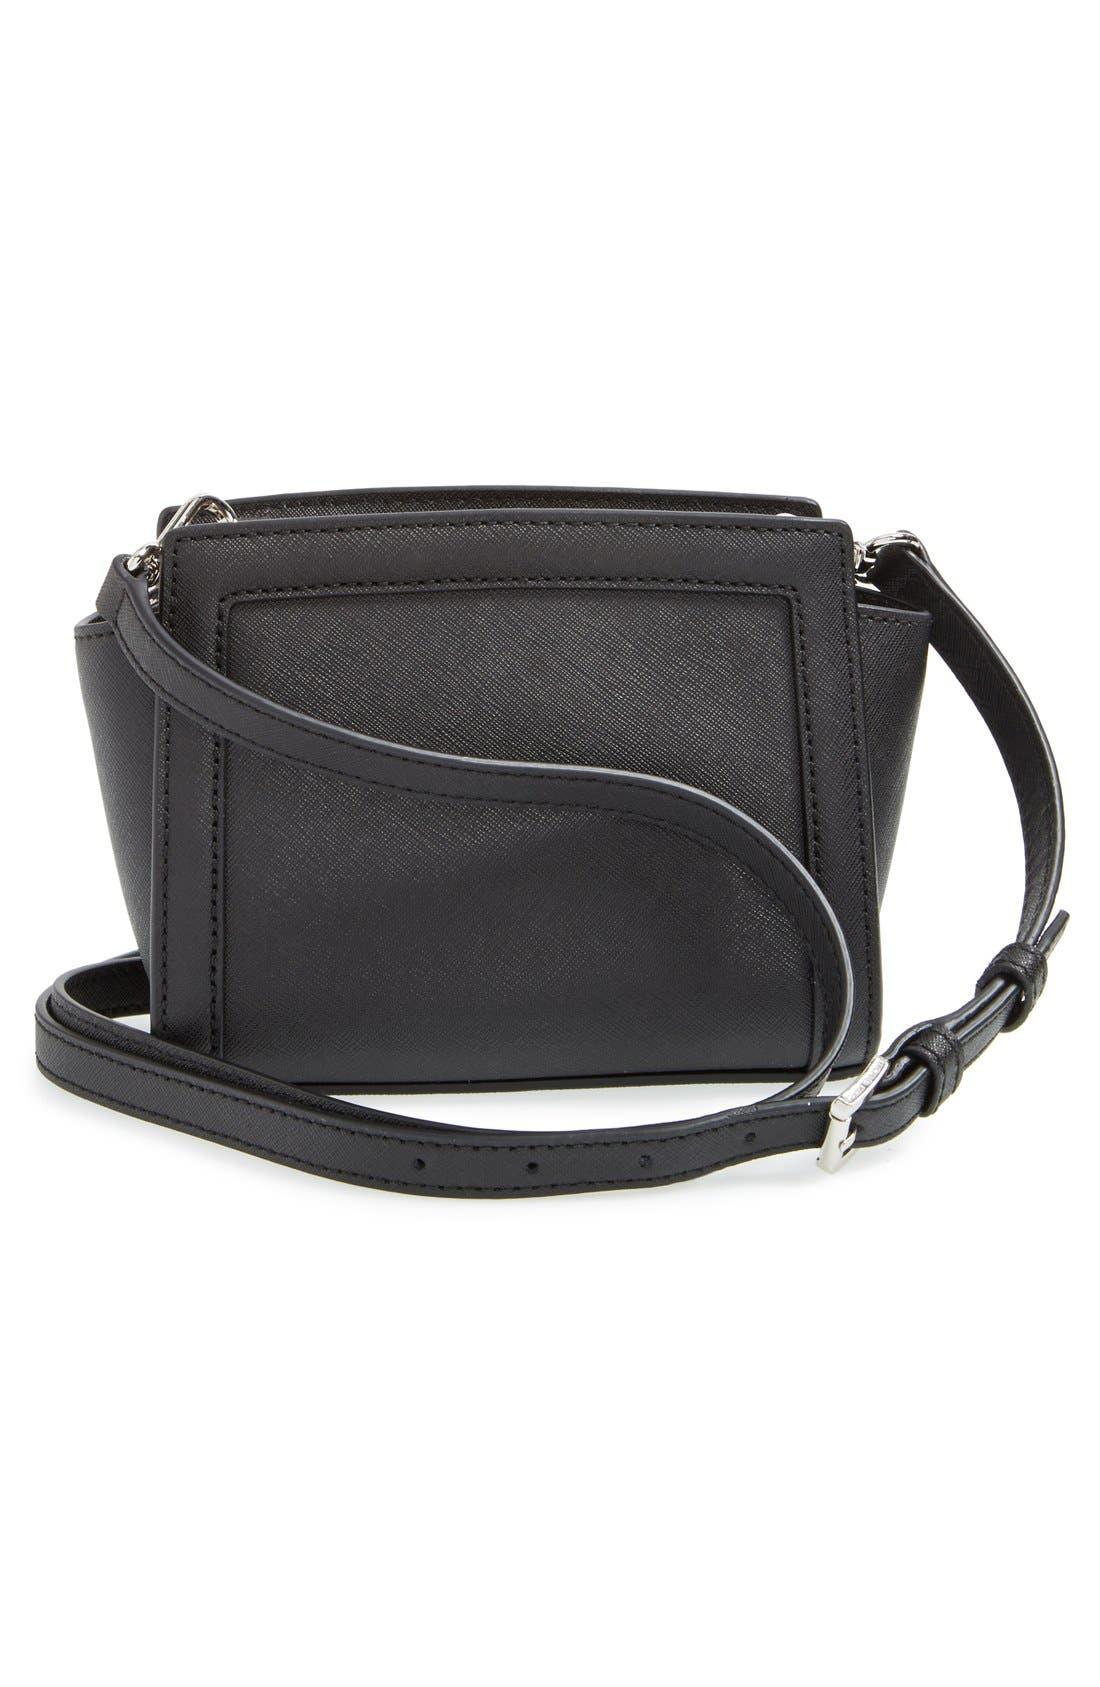 Alternate Image 3  - MICHAEL Michael Kors 'Mini Selma' Studded Saffiano Leather Crossbody Bag